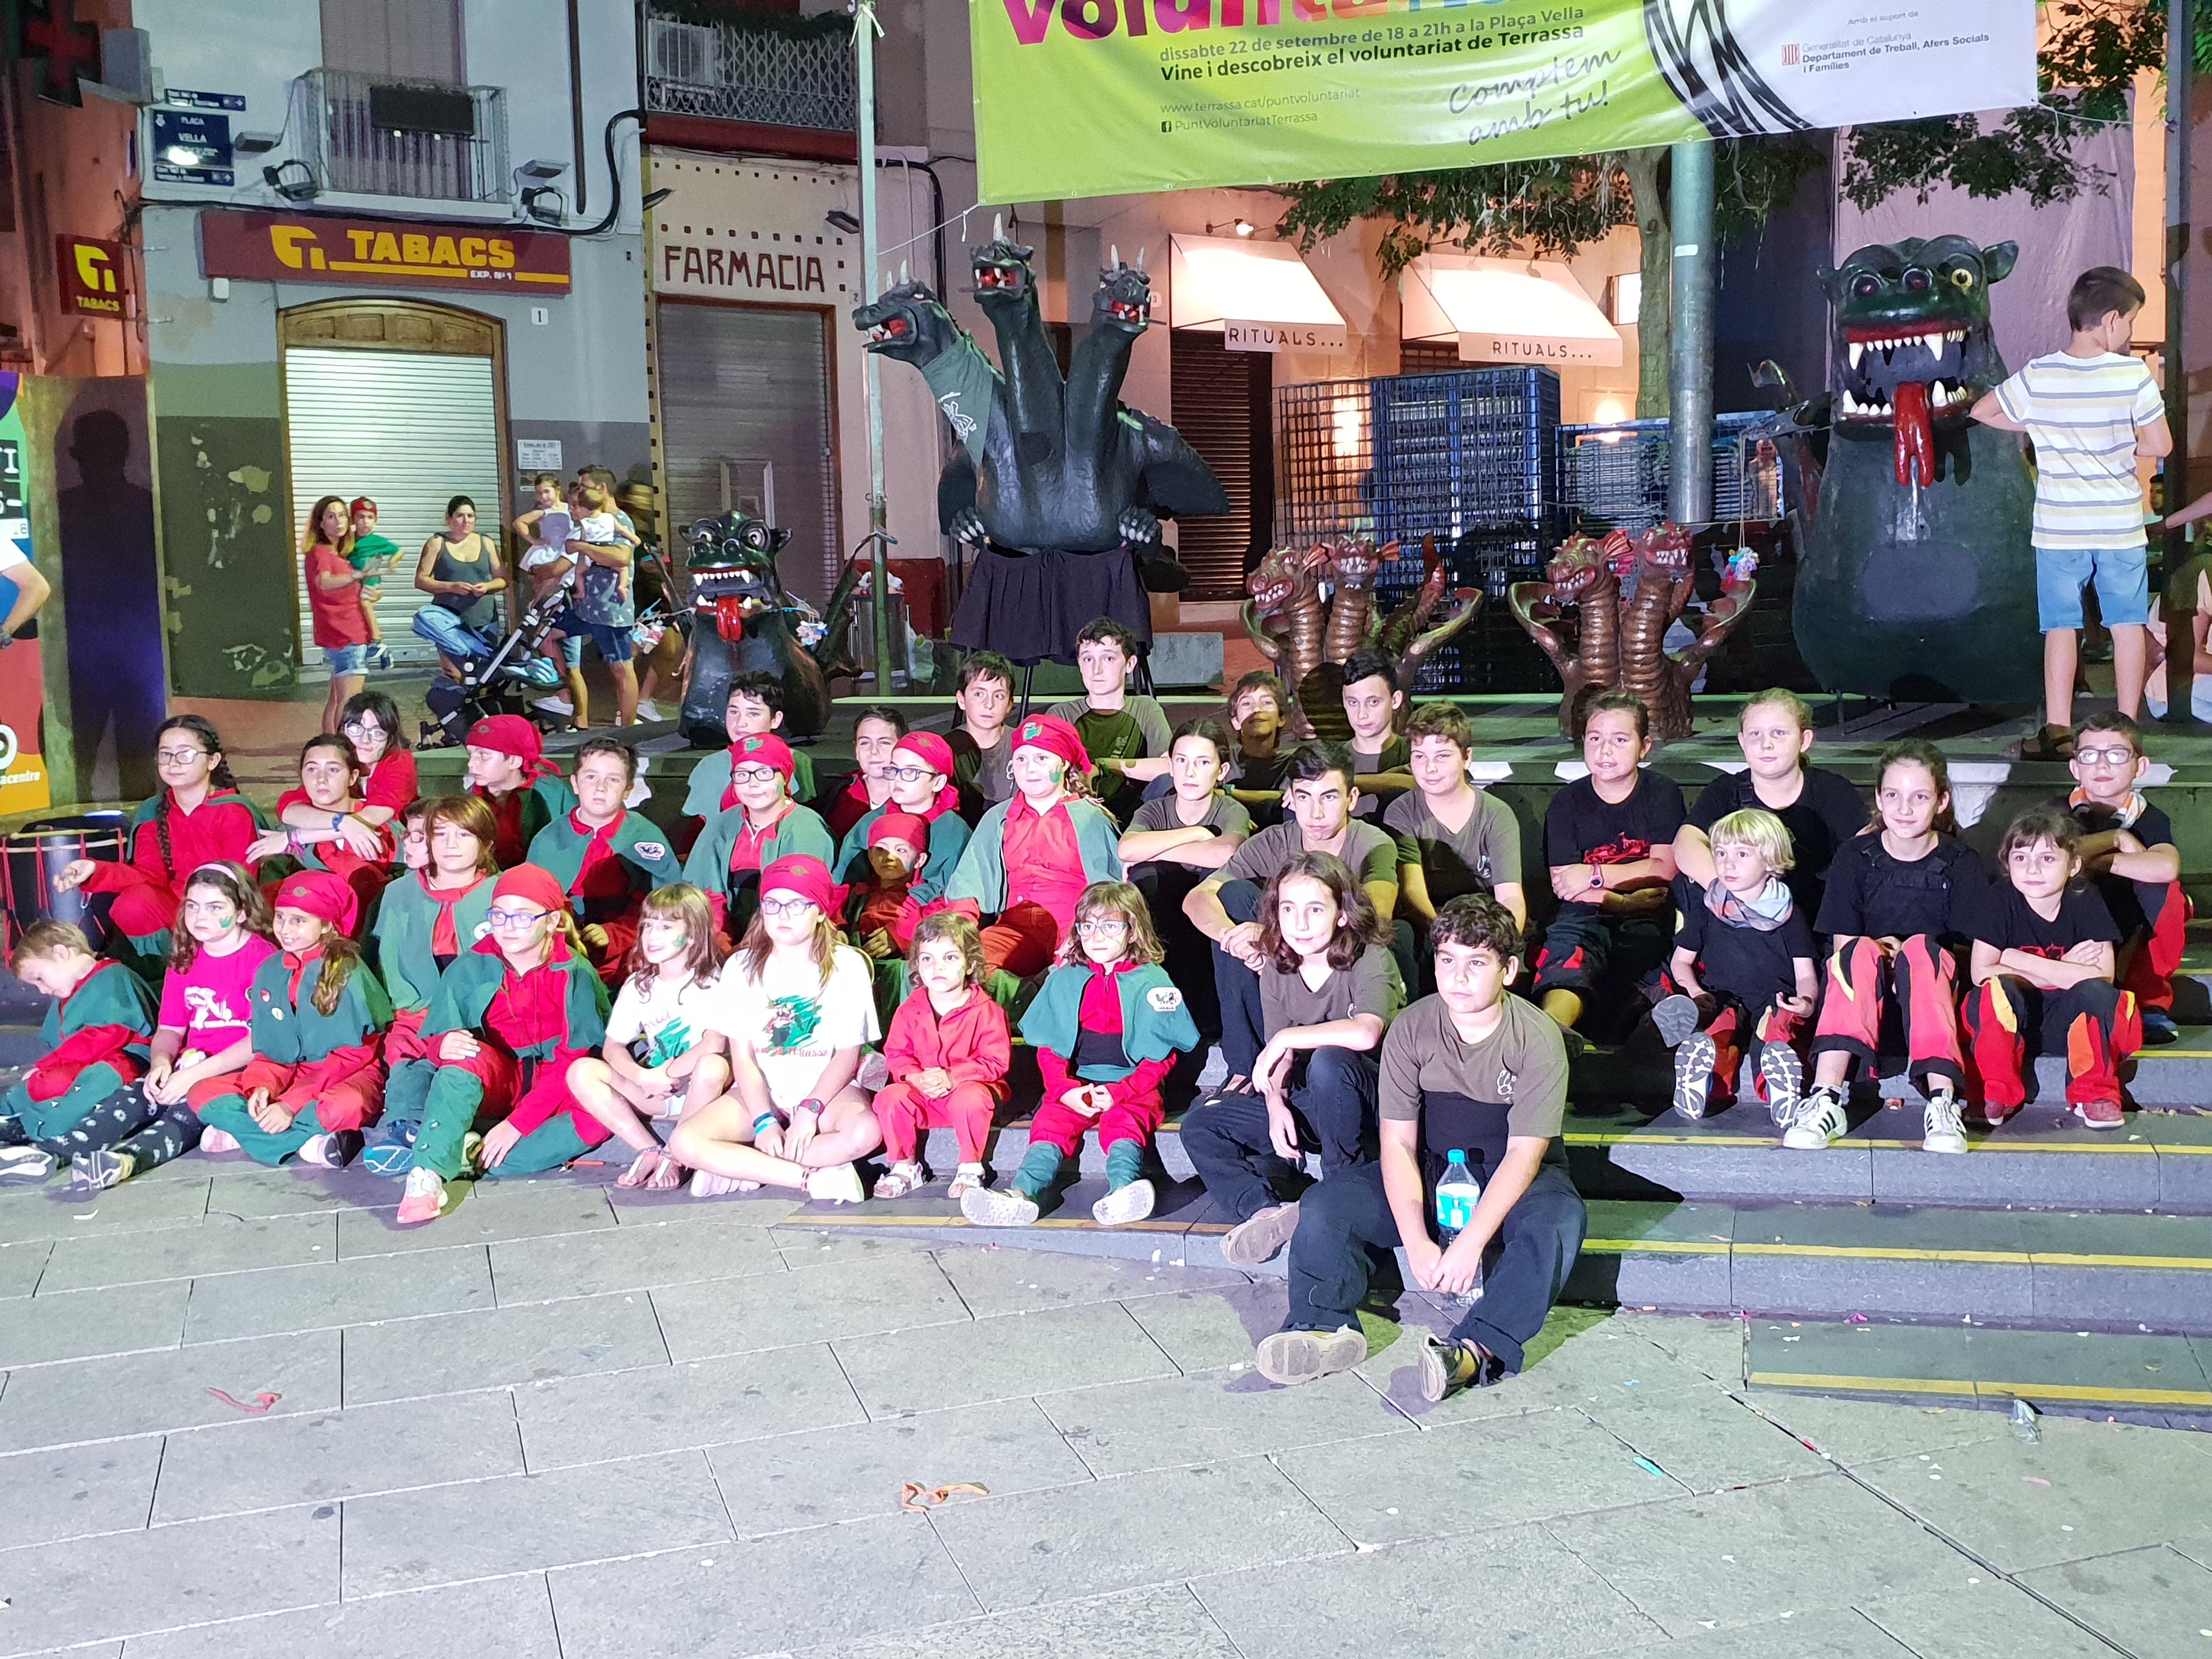 Terrassa - Granollers - Sabadell Diada del xumet Terrassa 23-9-18